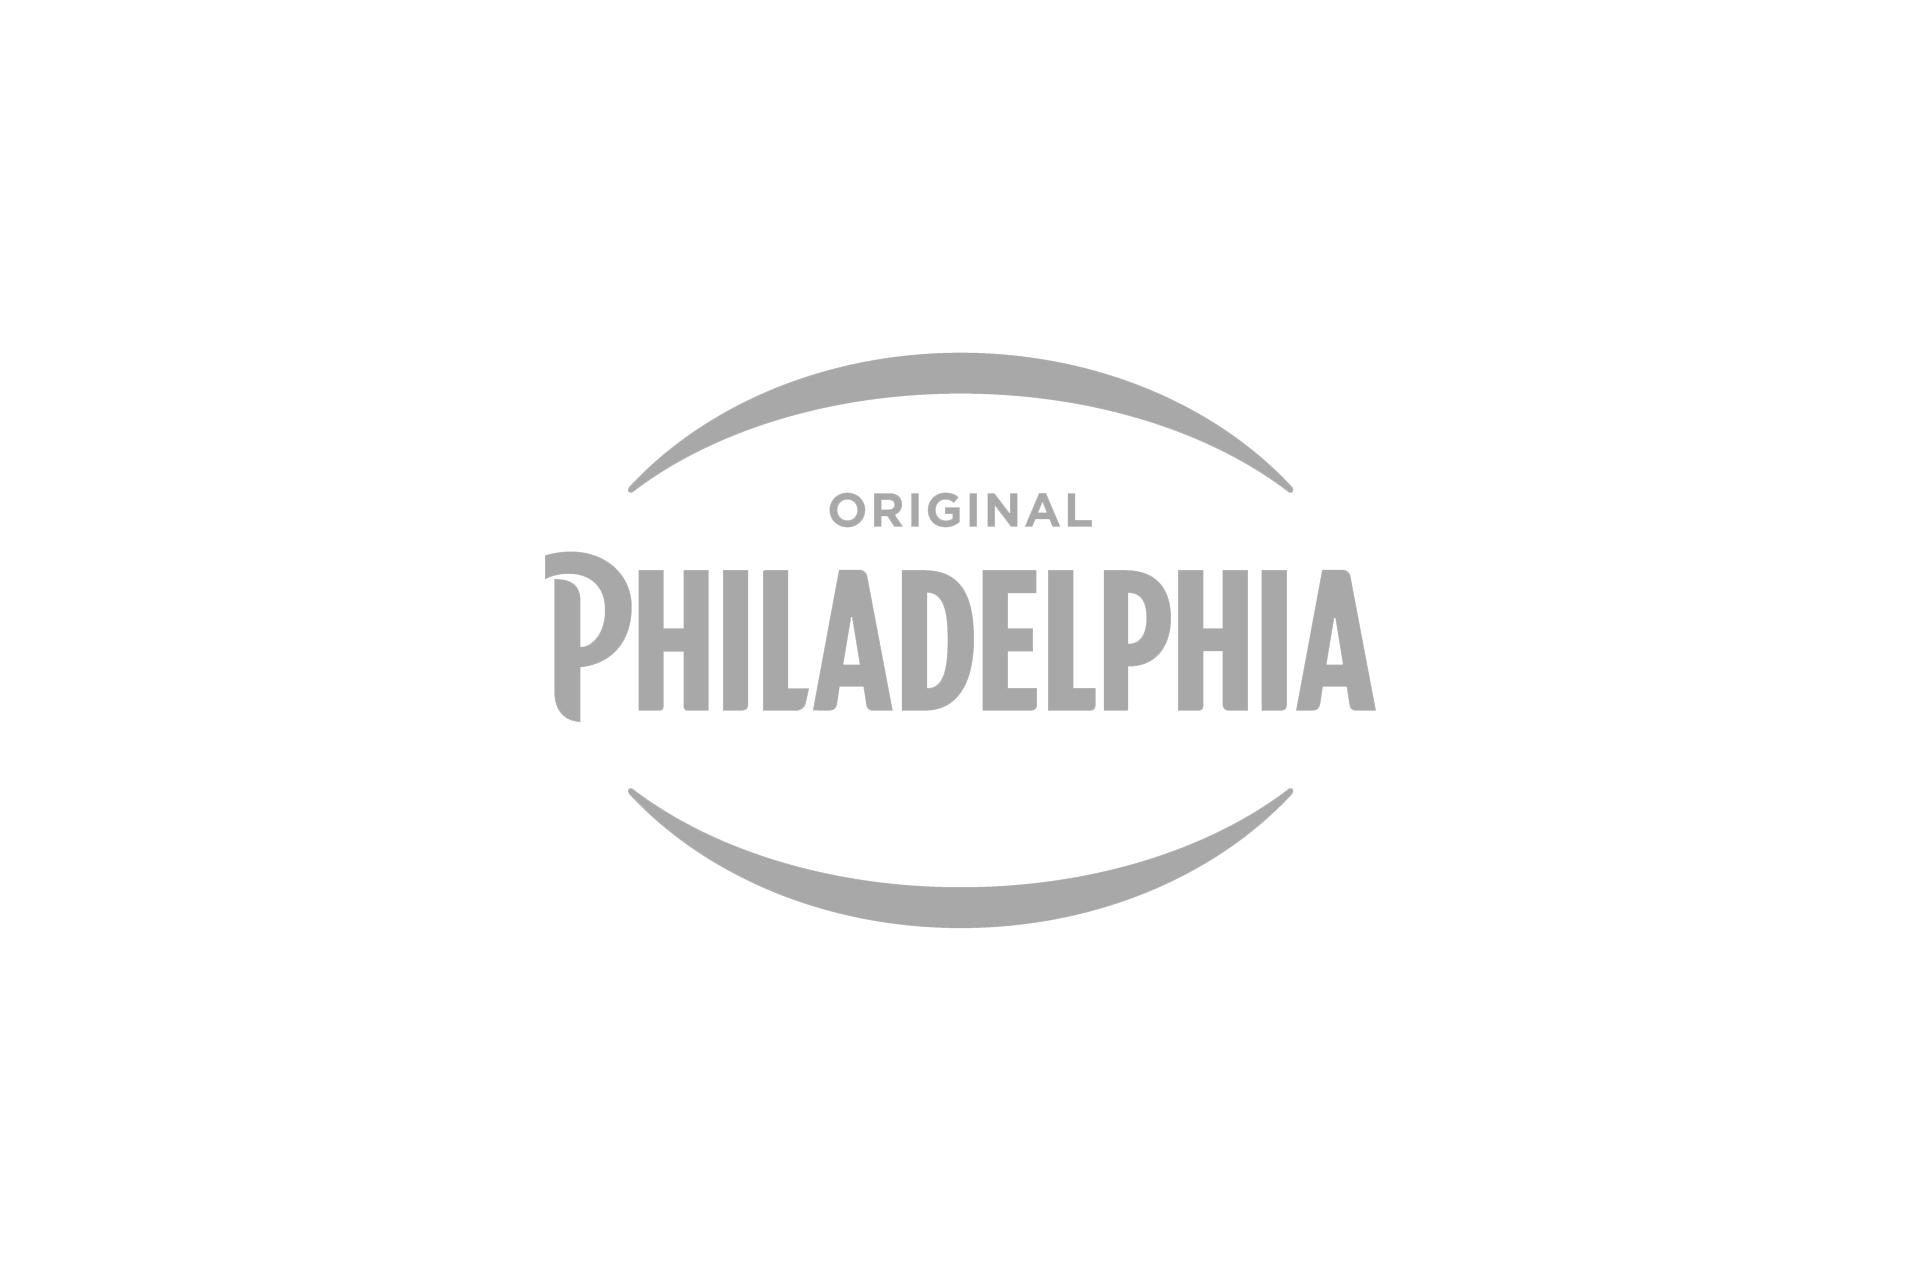 philadelphia logo grey